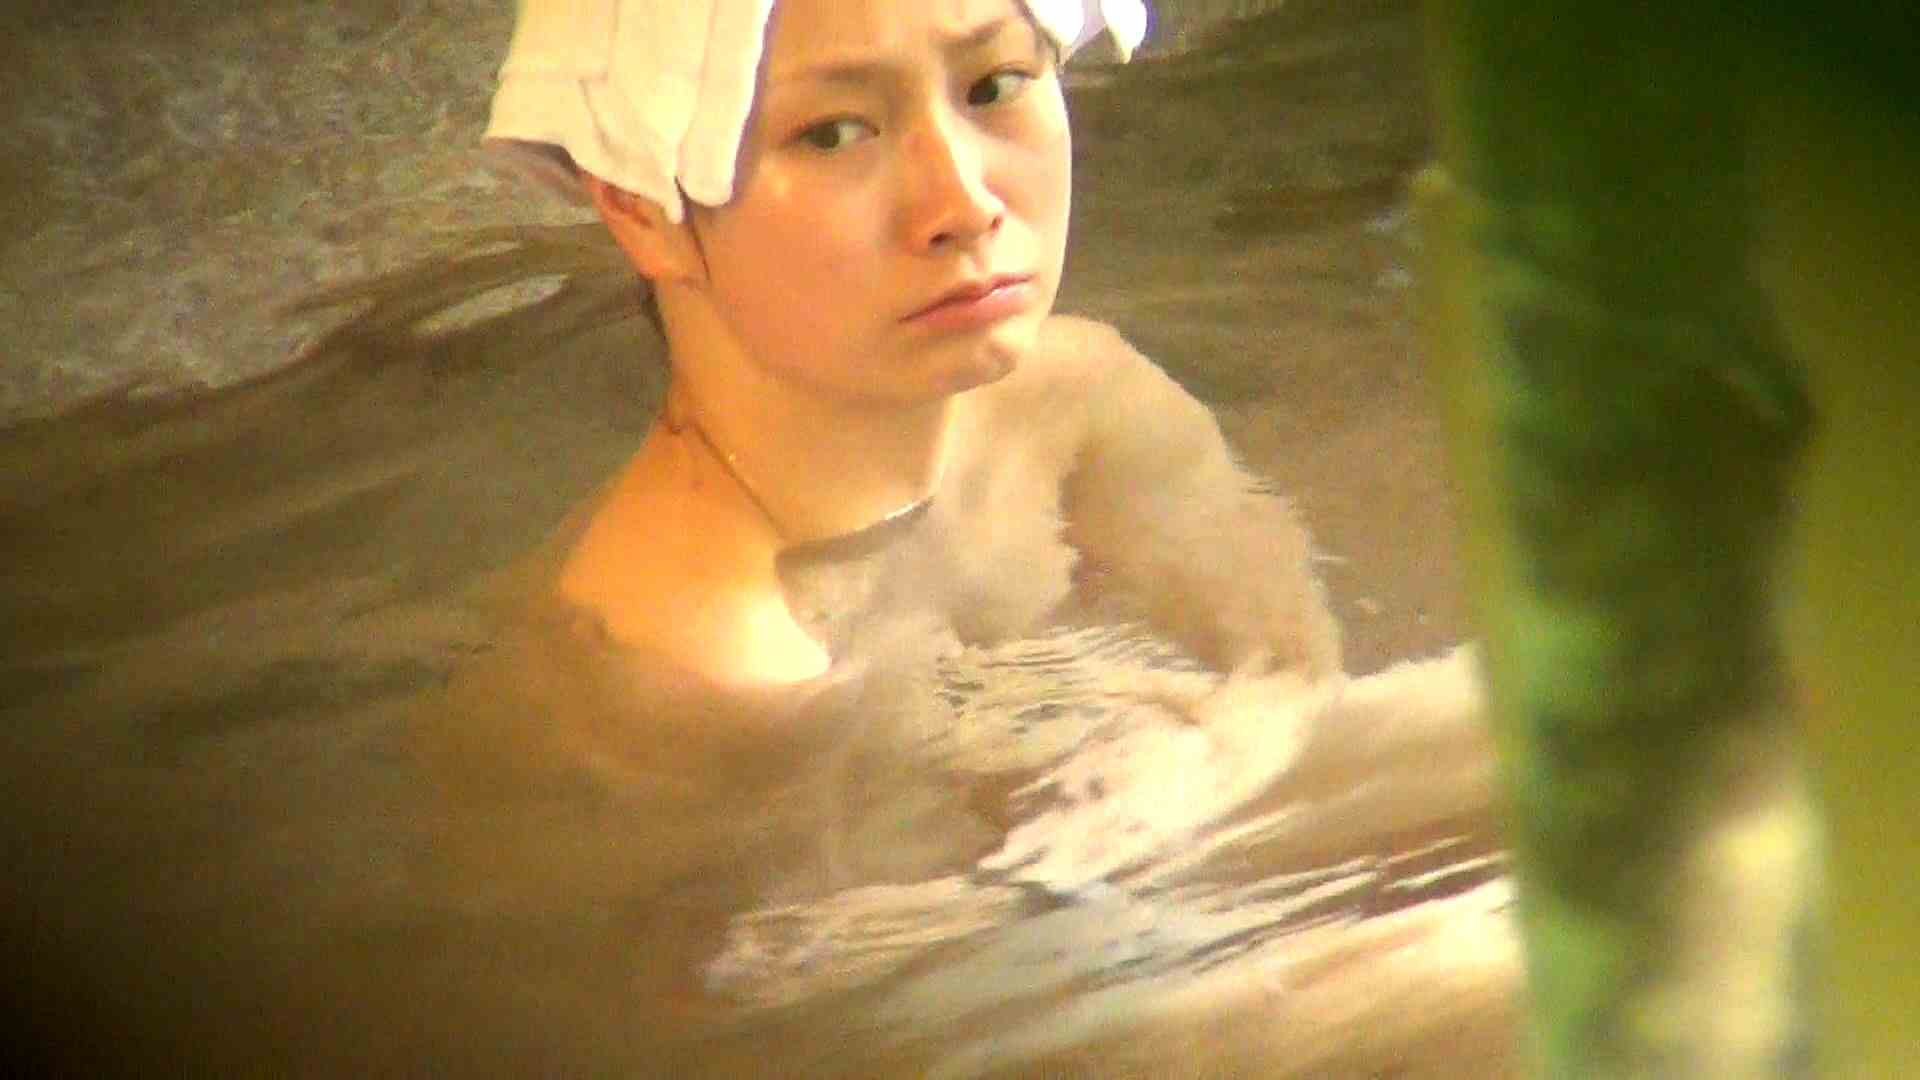 Aquaな露天風呂Vol.266 盗撮 おまんこ動画流出 84画像 77